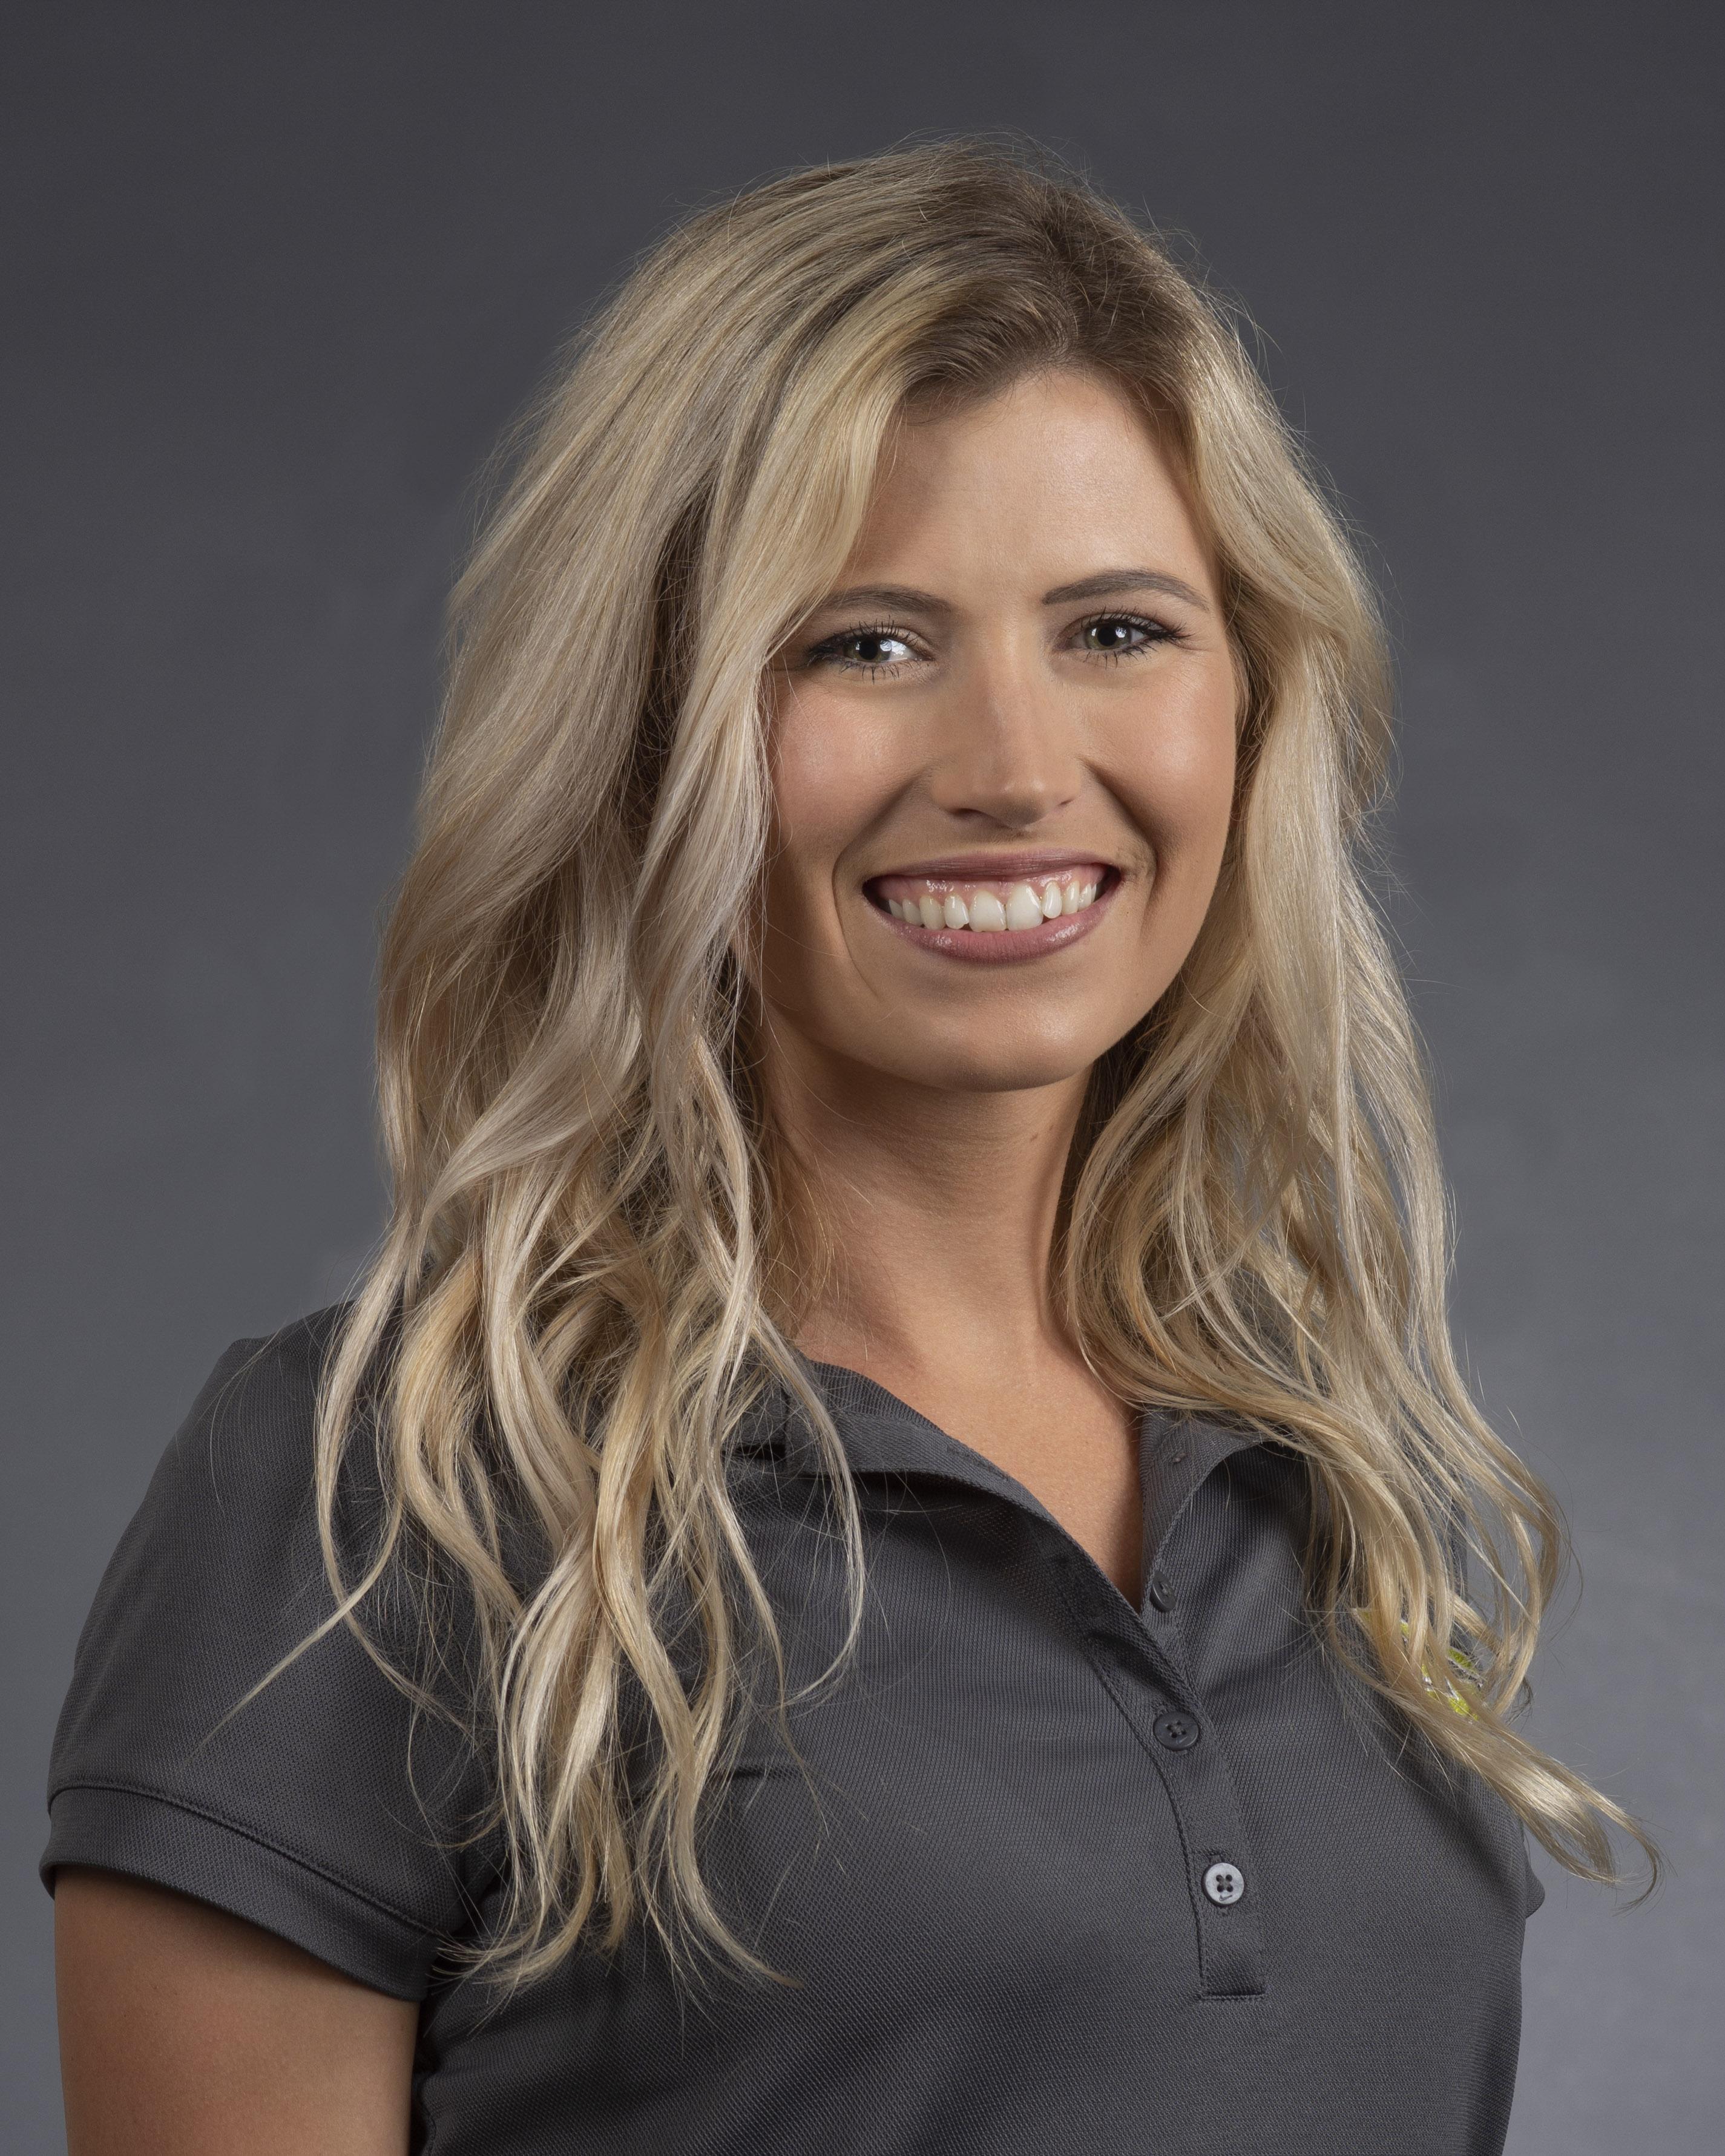 Haley Thompson | Fitness Tech